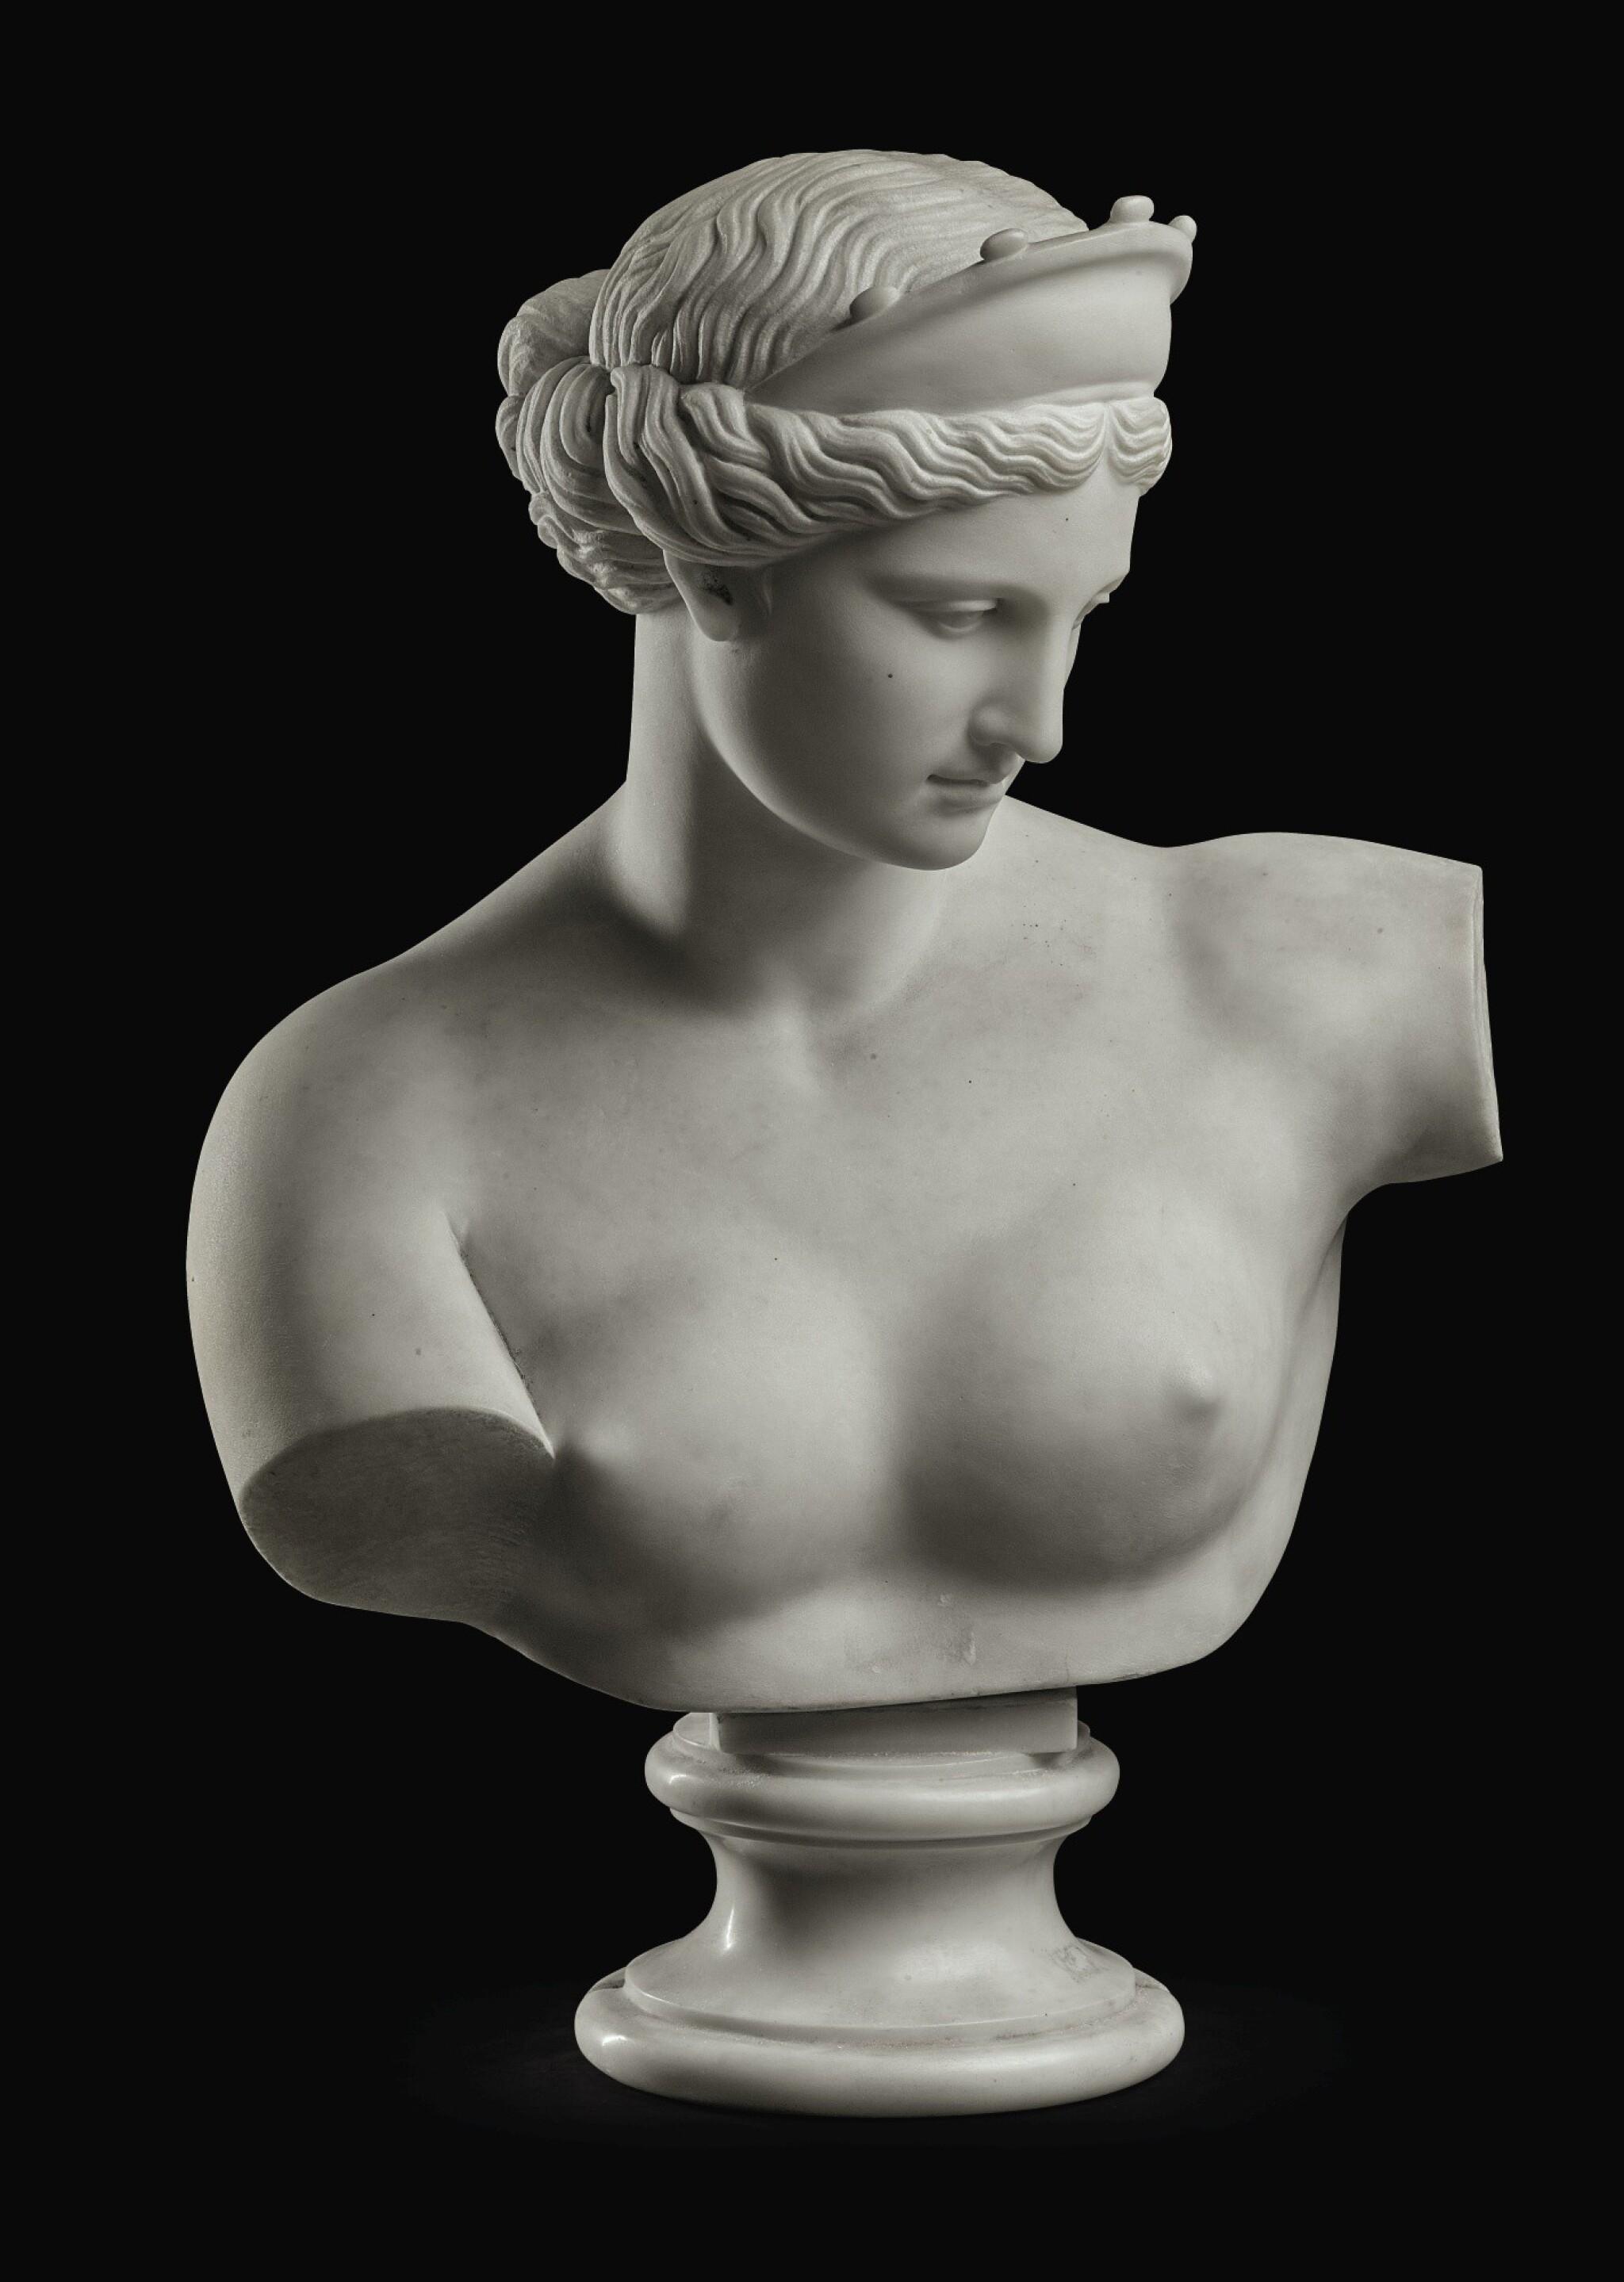 GAETANO ROSSI, AFTER THE ANTIQUE   BUST OF THE VENUS OF CAPUA